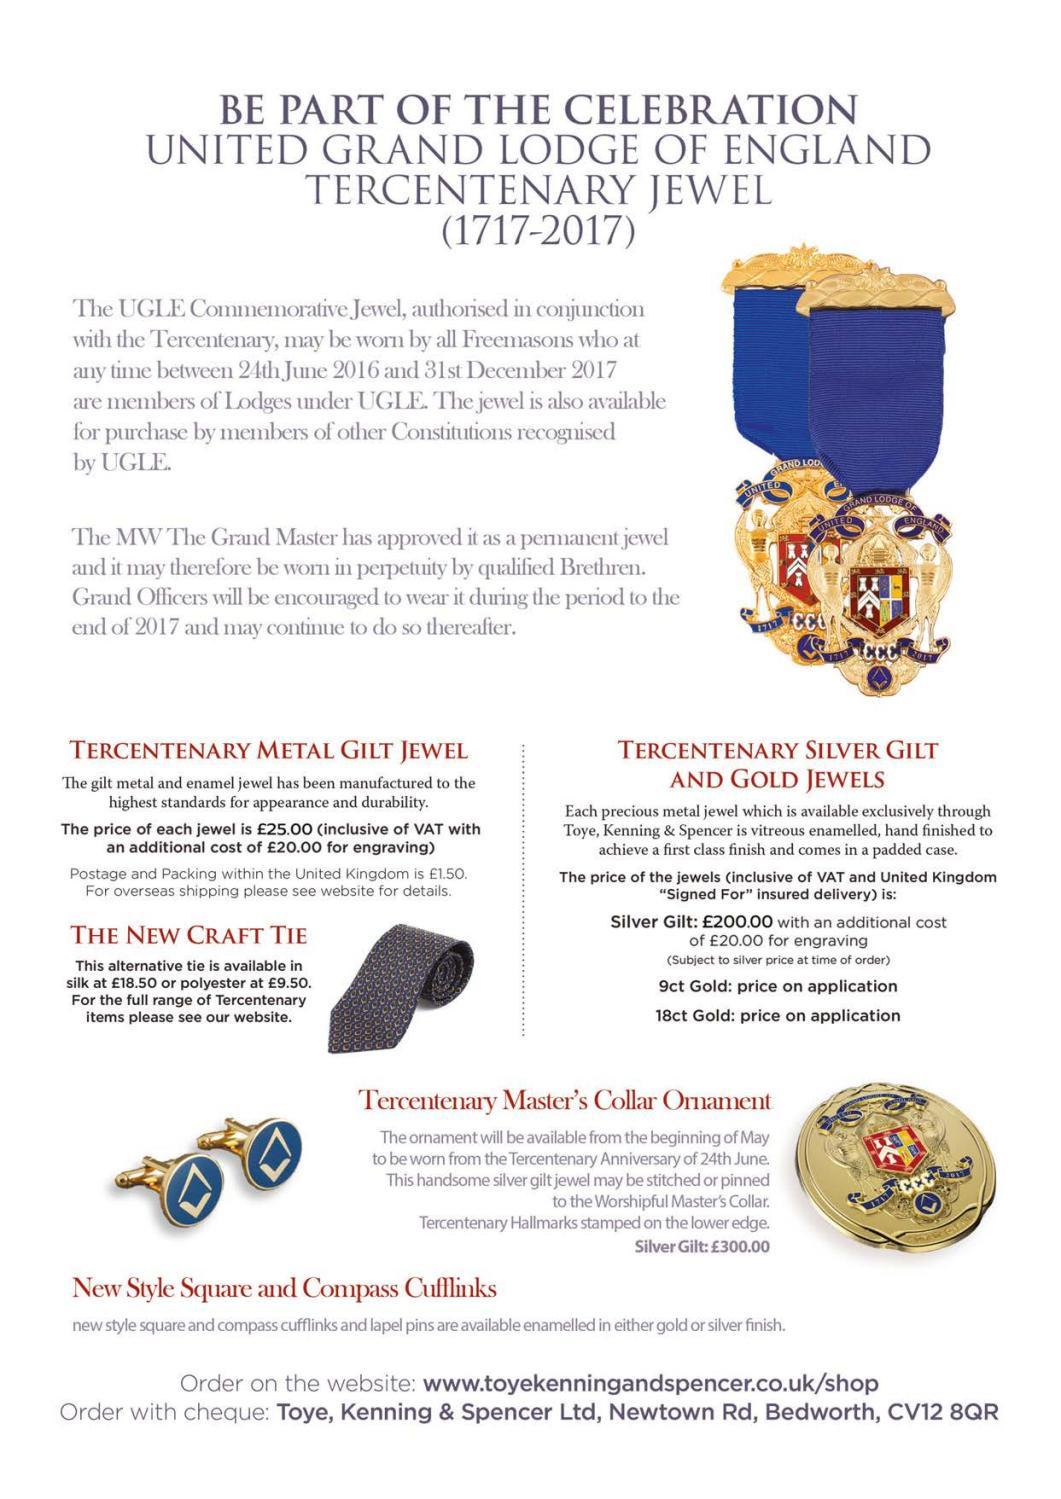 Freemasonry Today - Winter 2017 - Issue 40 by UGLE - issuu